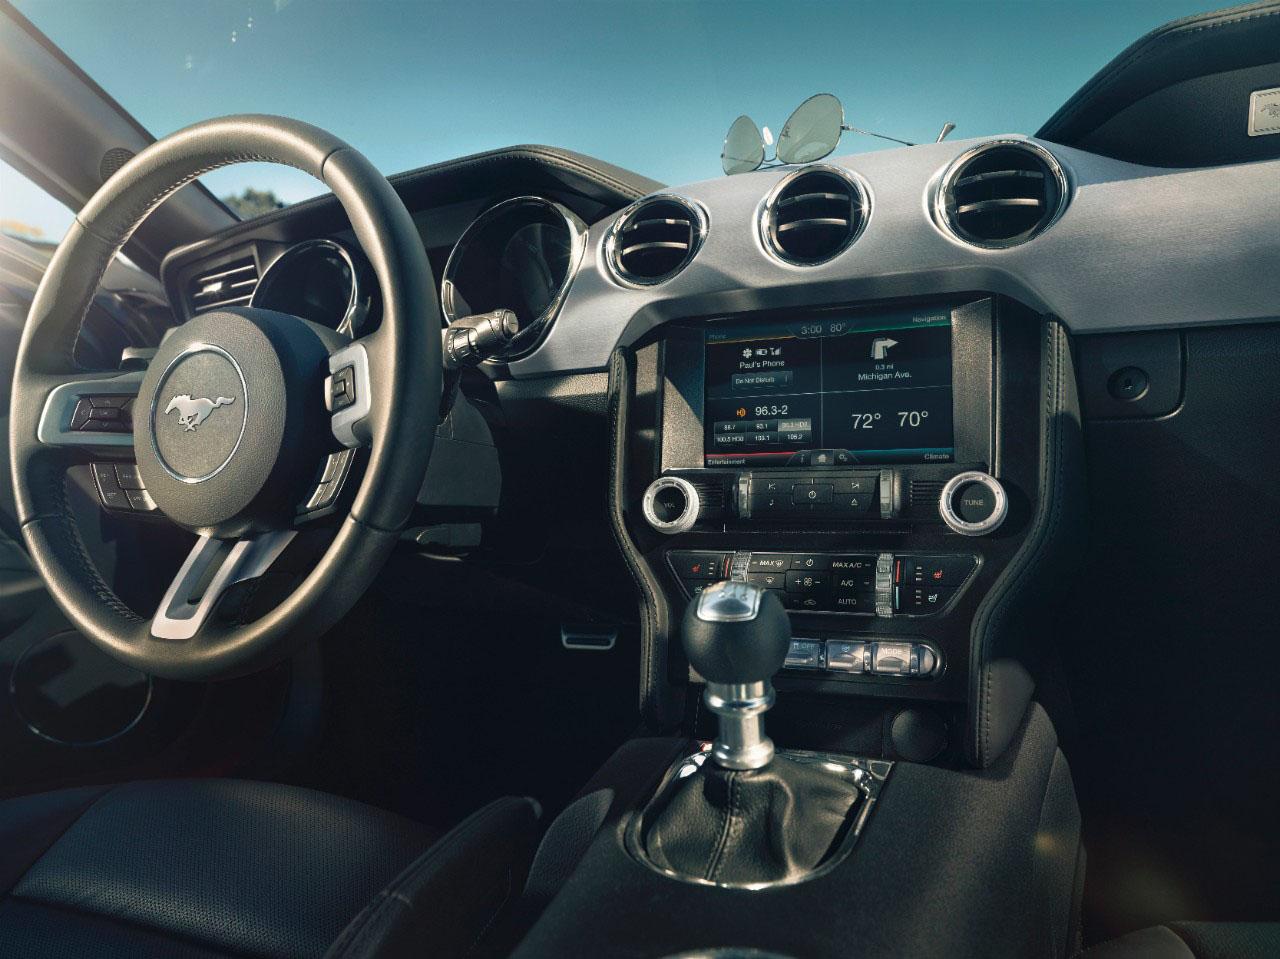 all new 2015 ford mustang - The All New Ford Mustang Gt